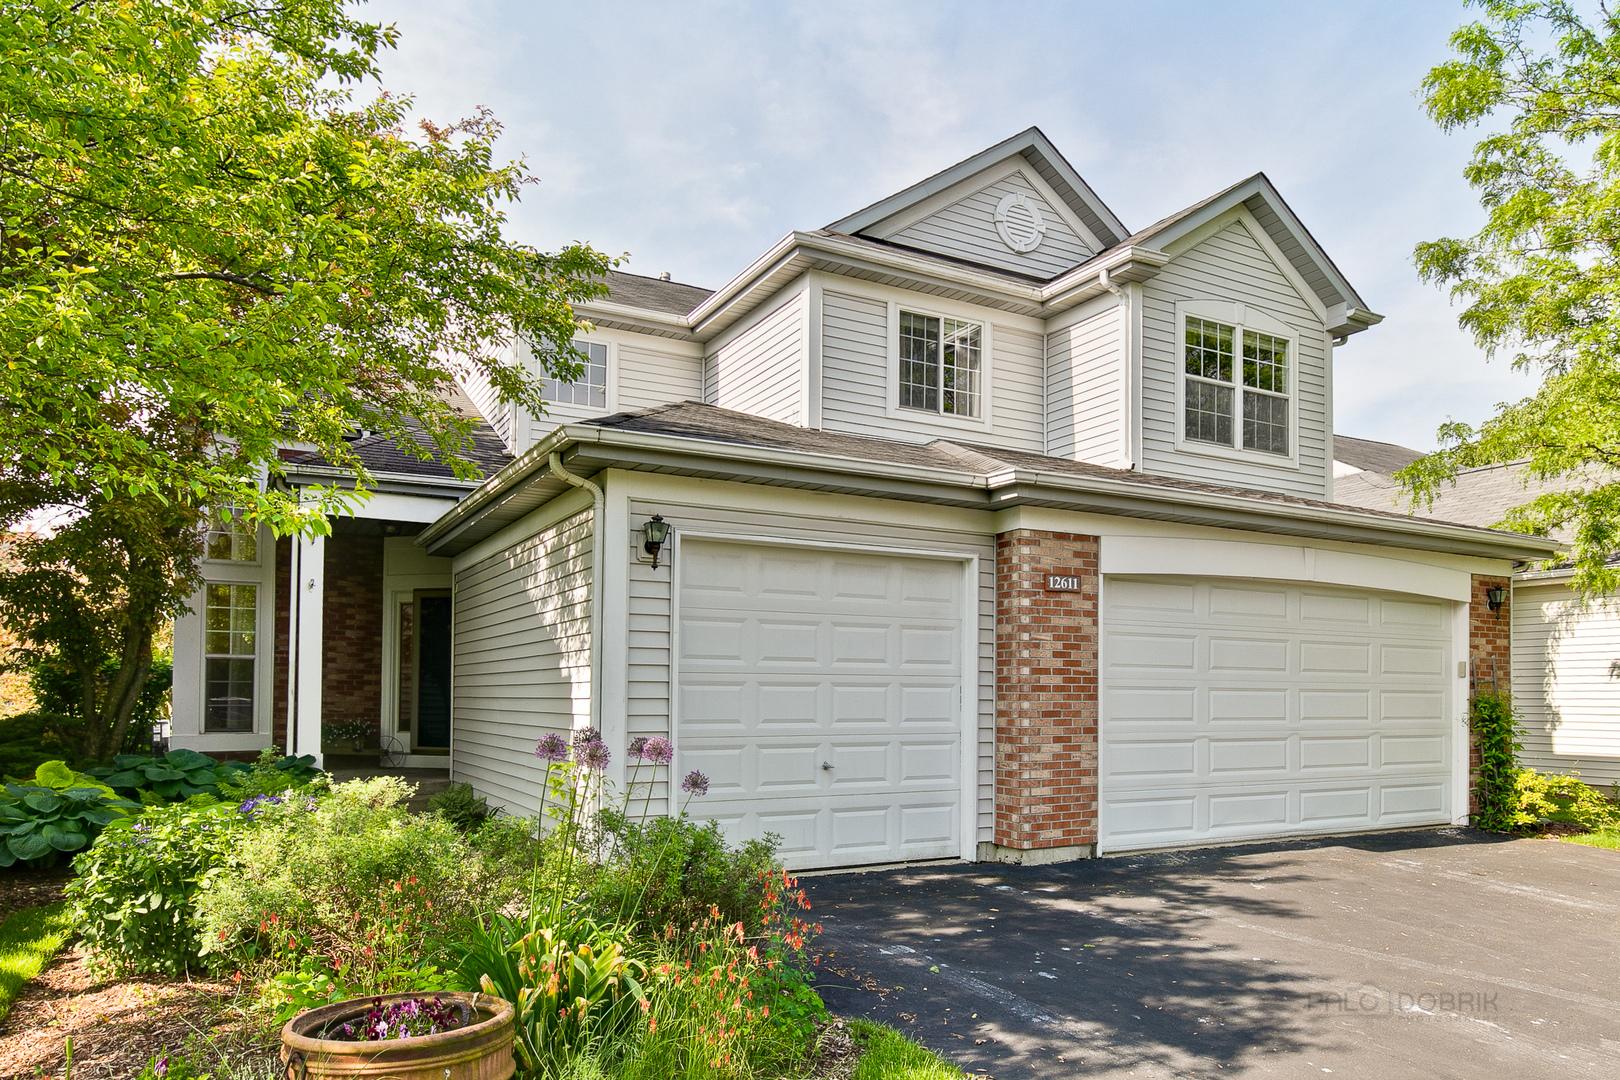 12611 Meadow Circle, Lake Bluff, Illinois 60044